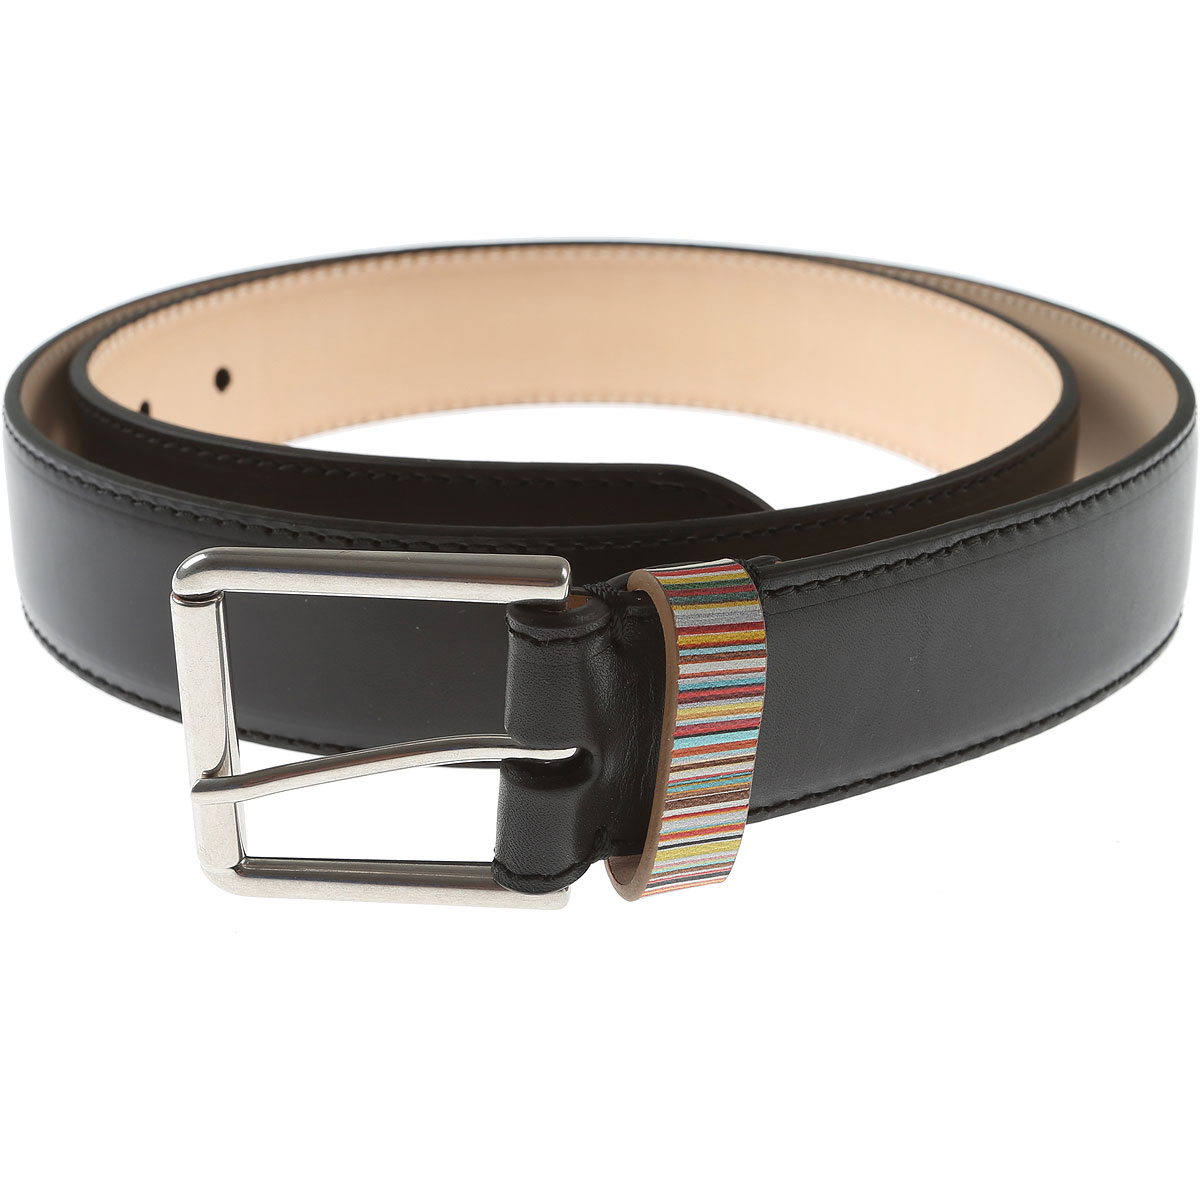 Paul Smith Mens Belts, Black, Leather, 2017, 36 38 40